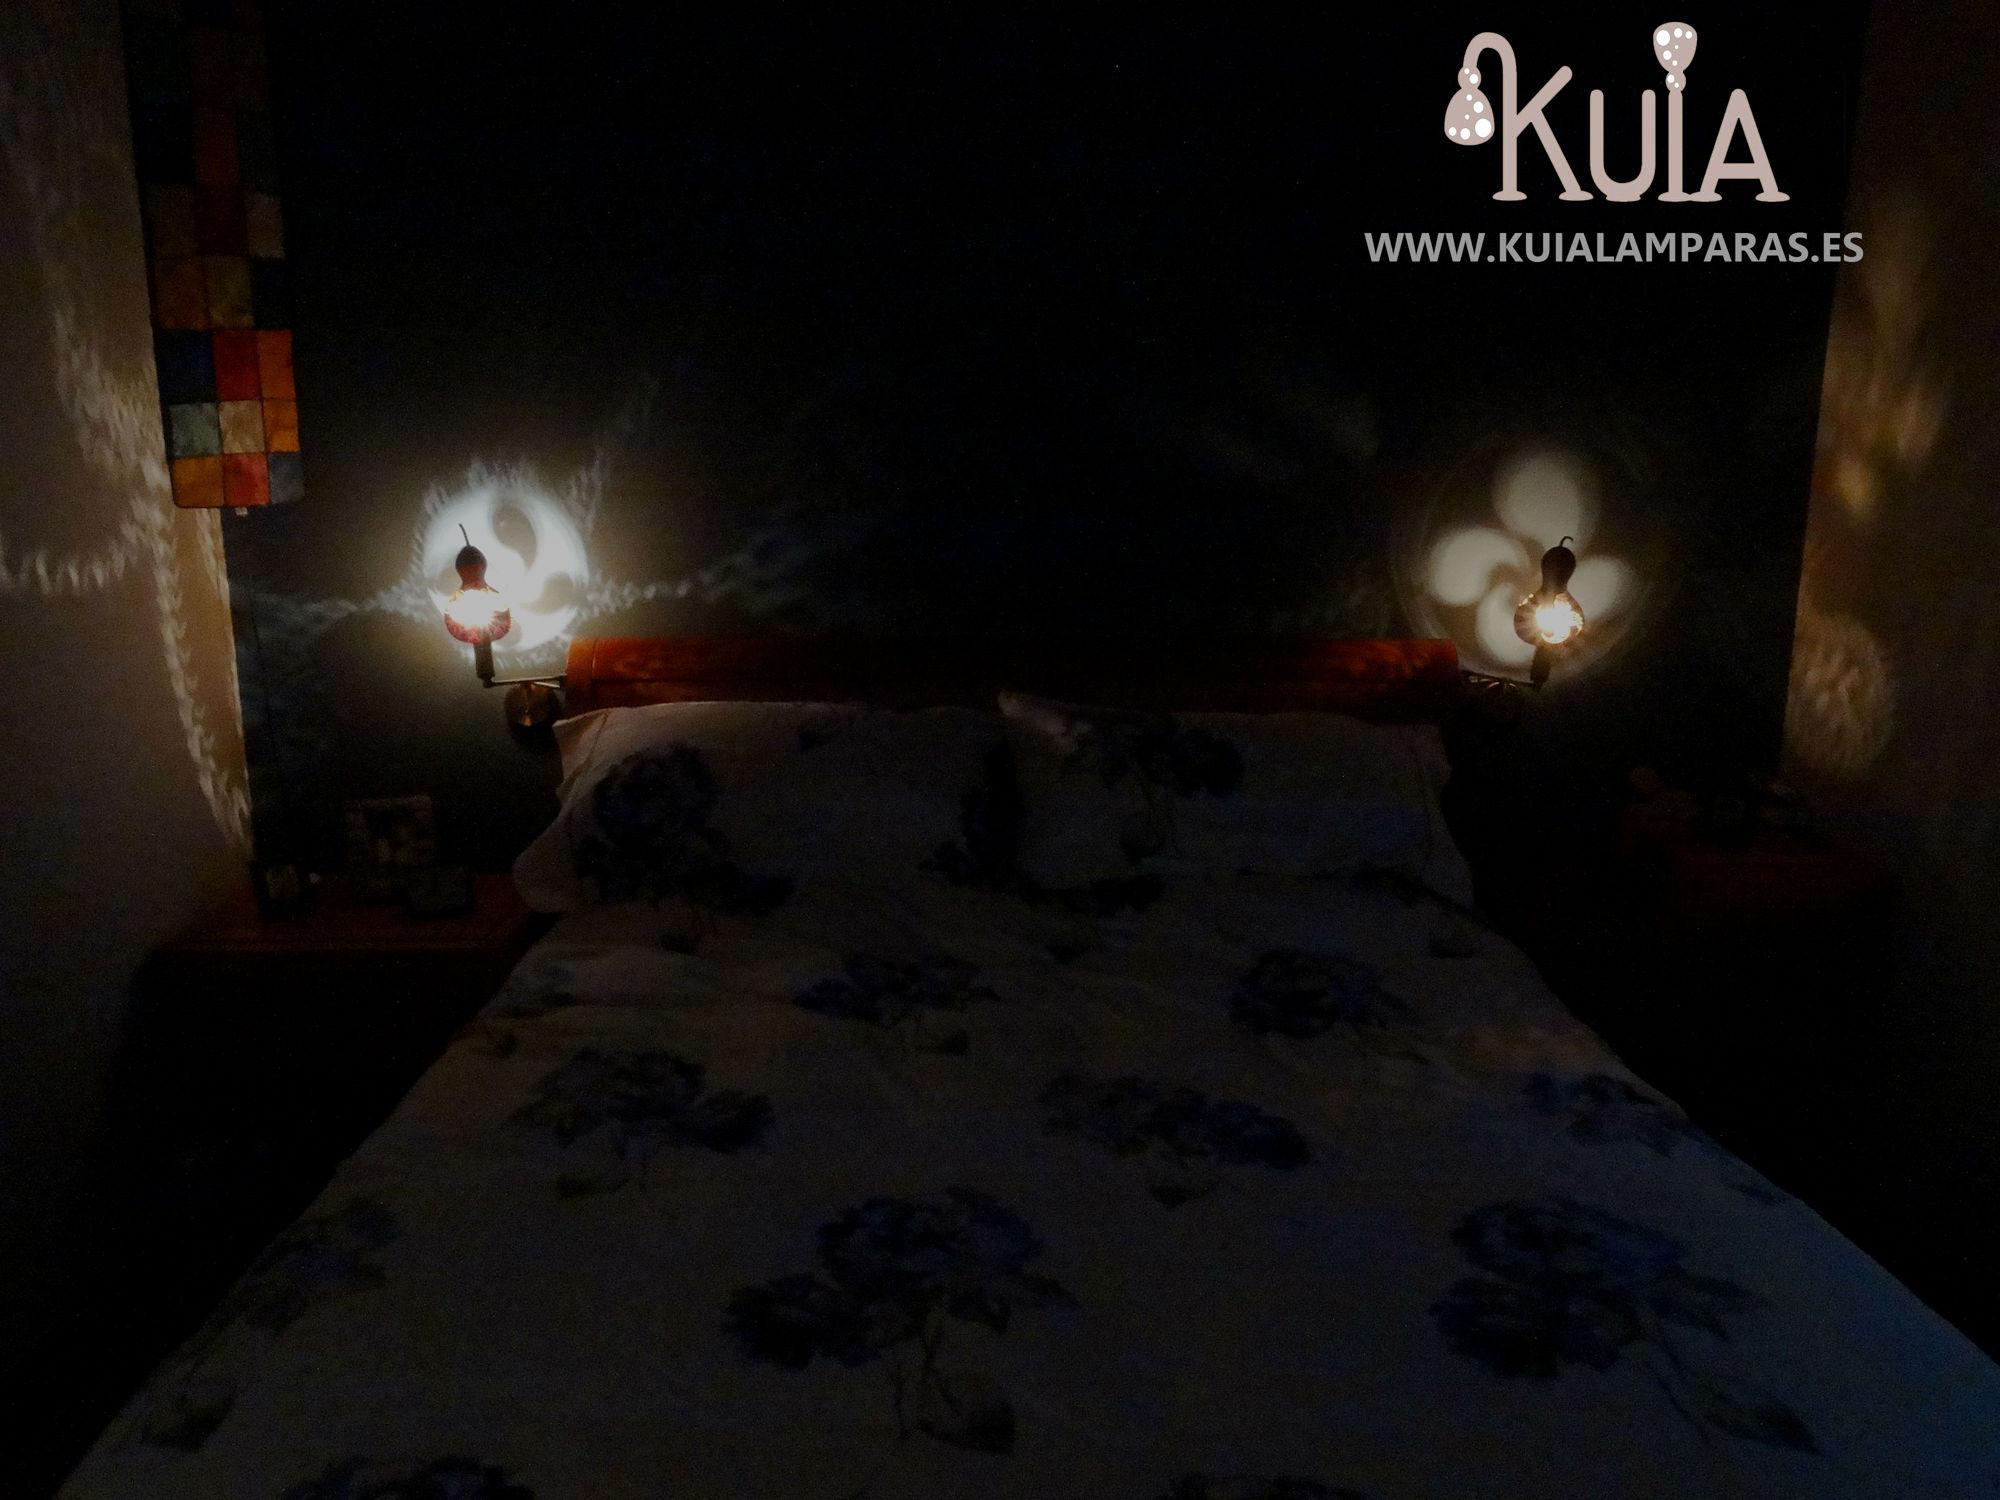 lamparas de pared artesanales decorativas lauburu2